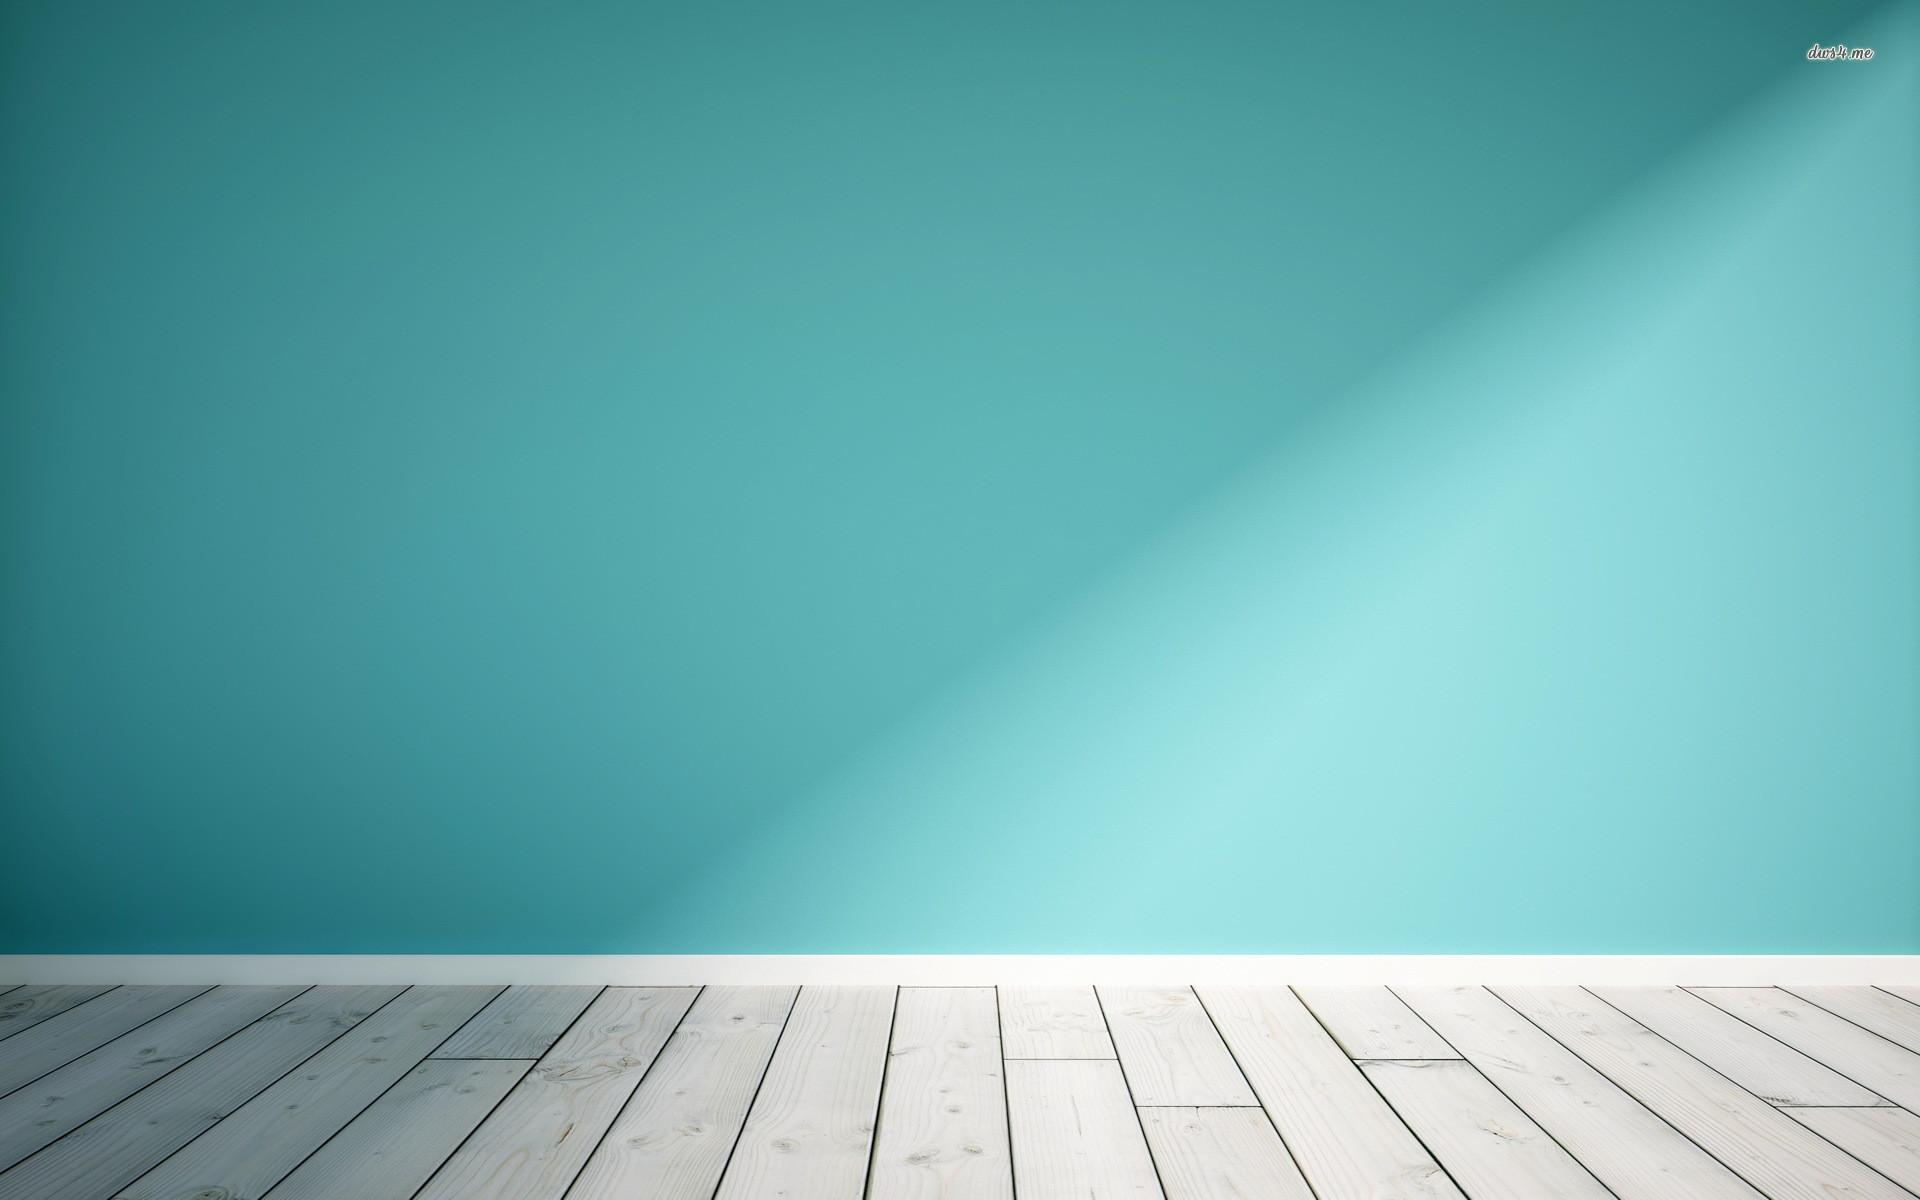 Wooden floor and blue wall wallpaper – Digital Art wallpapers – #48705